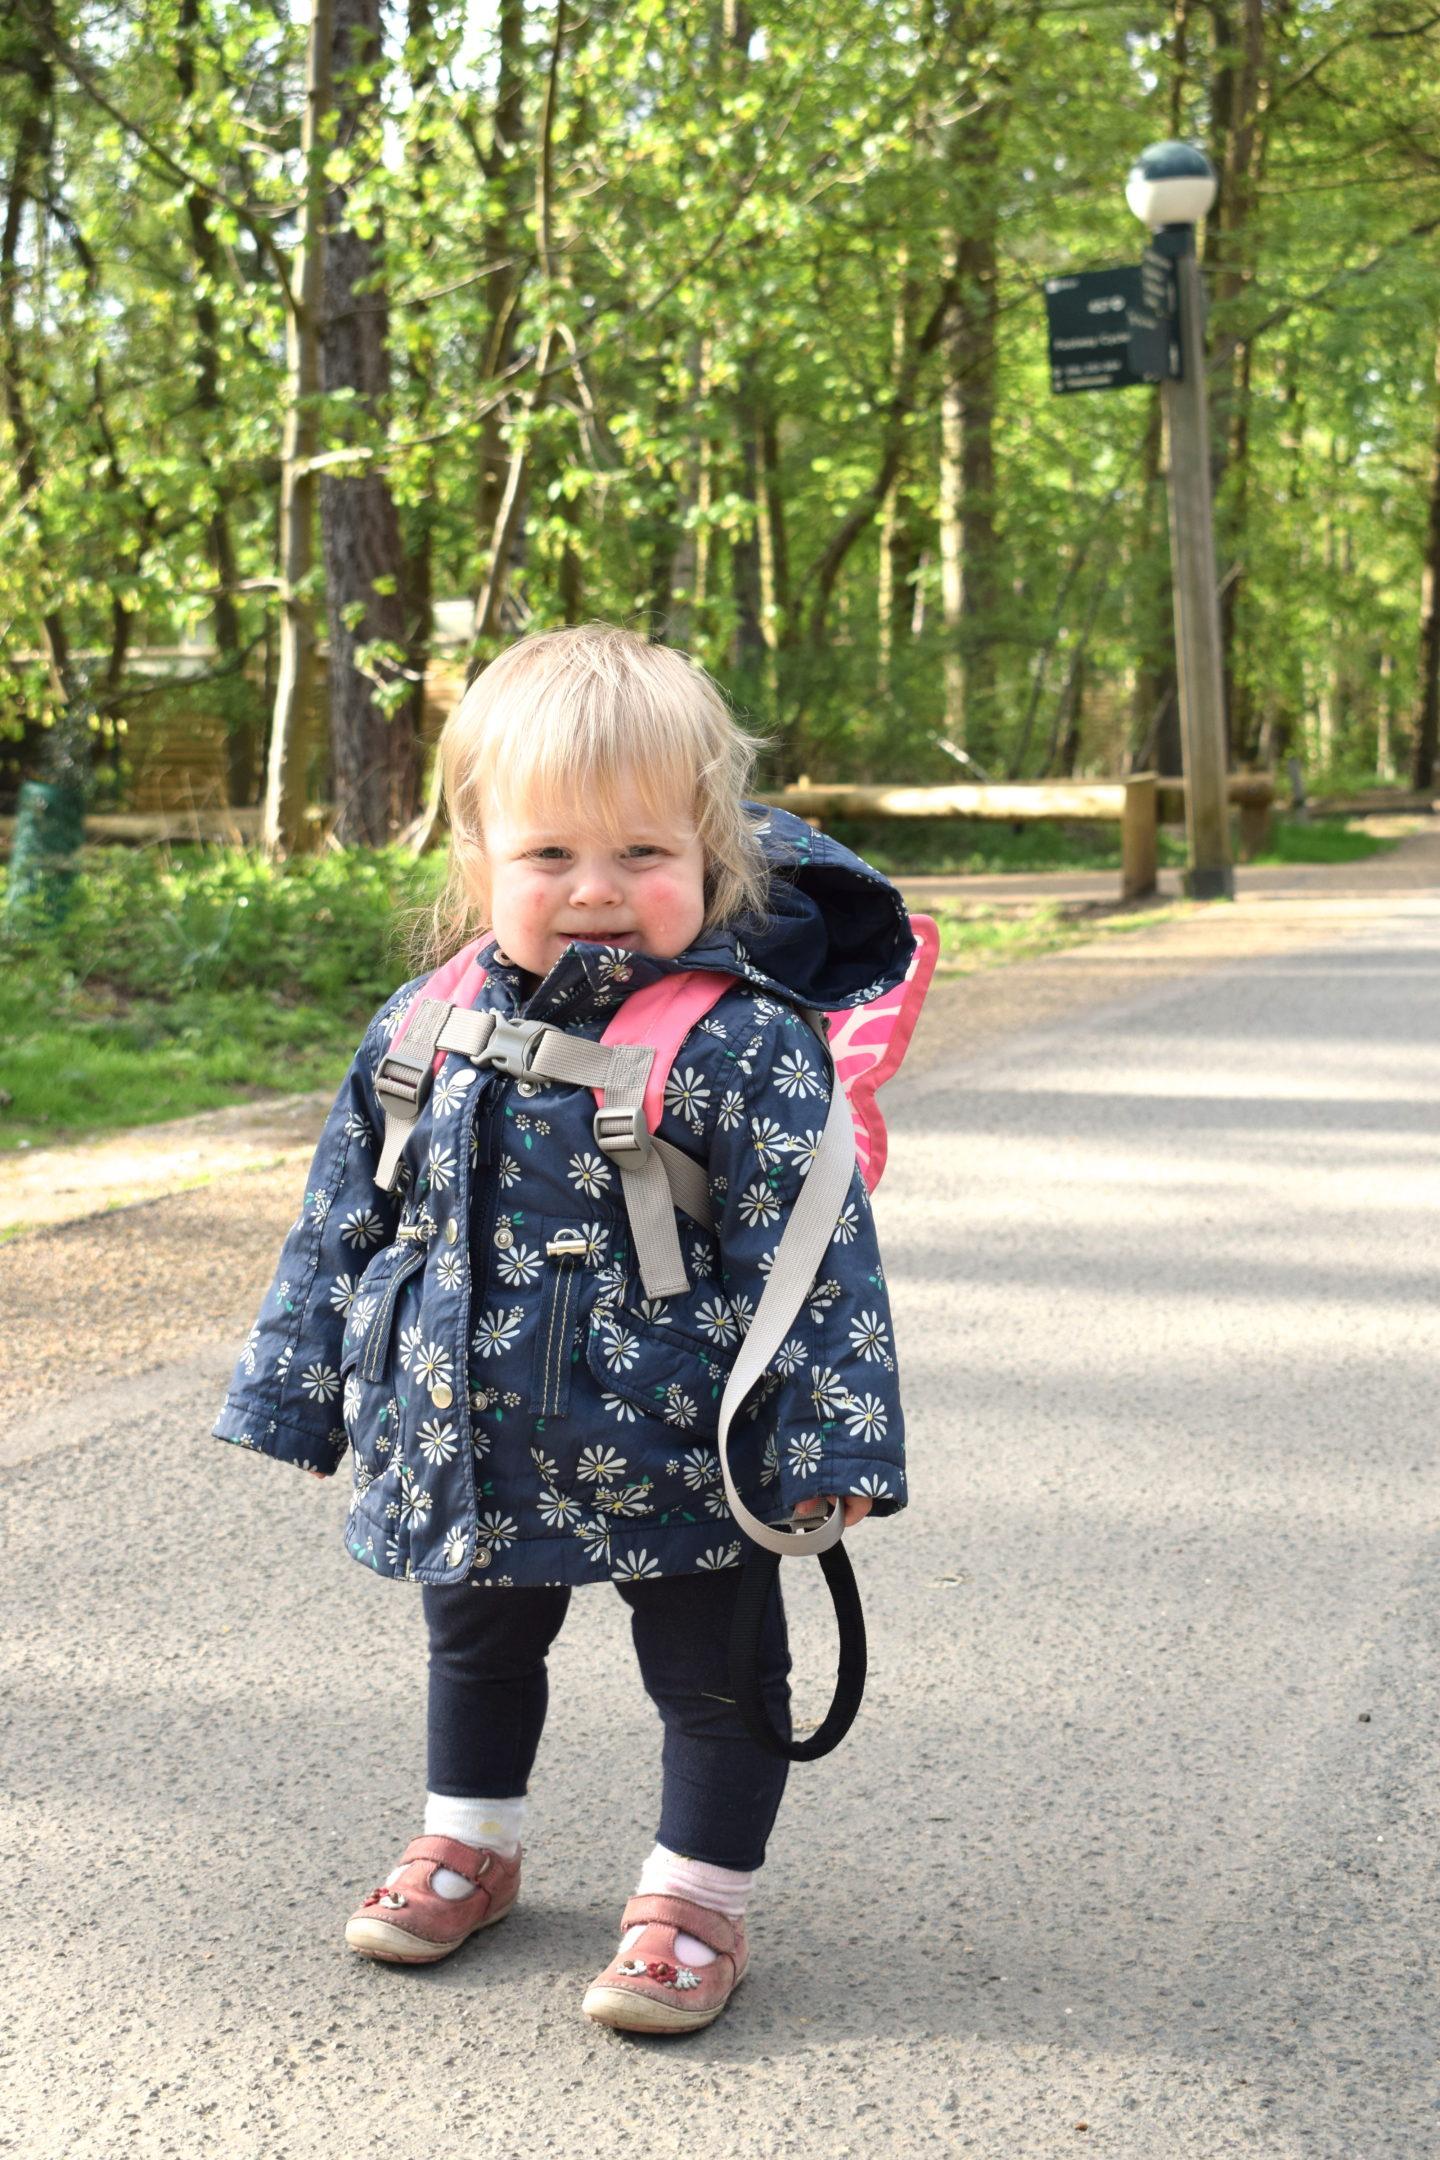 one year old walking in Center Parcs Elveden Forest